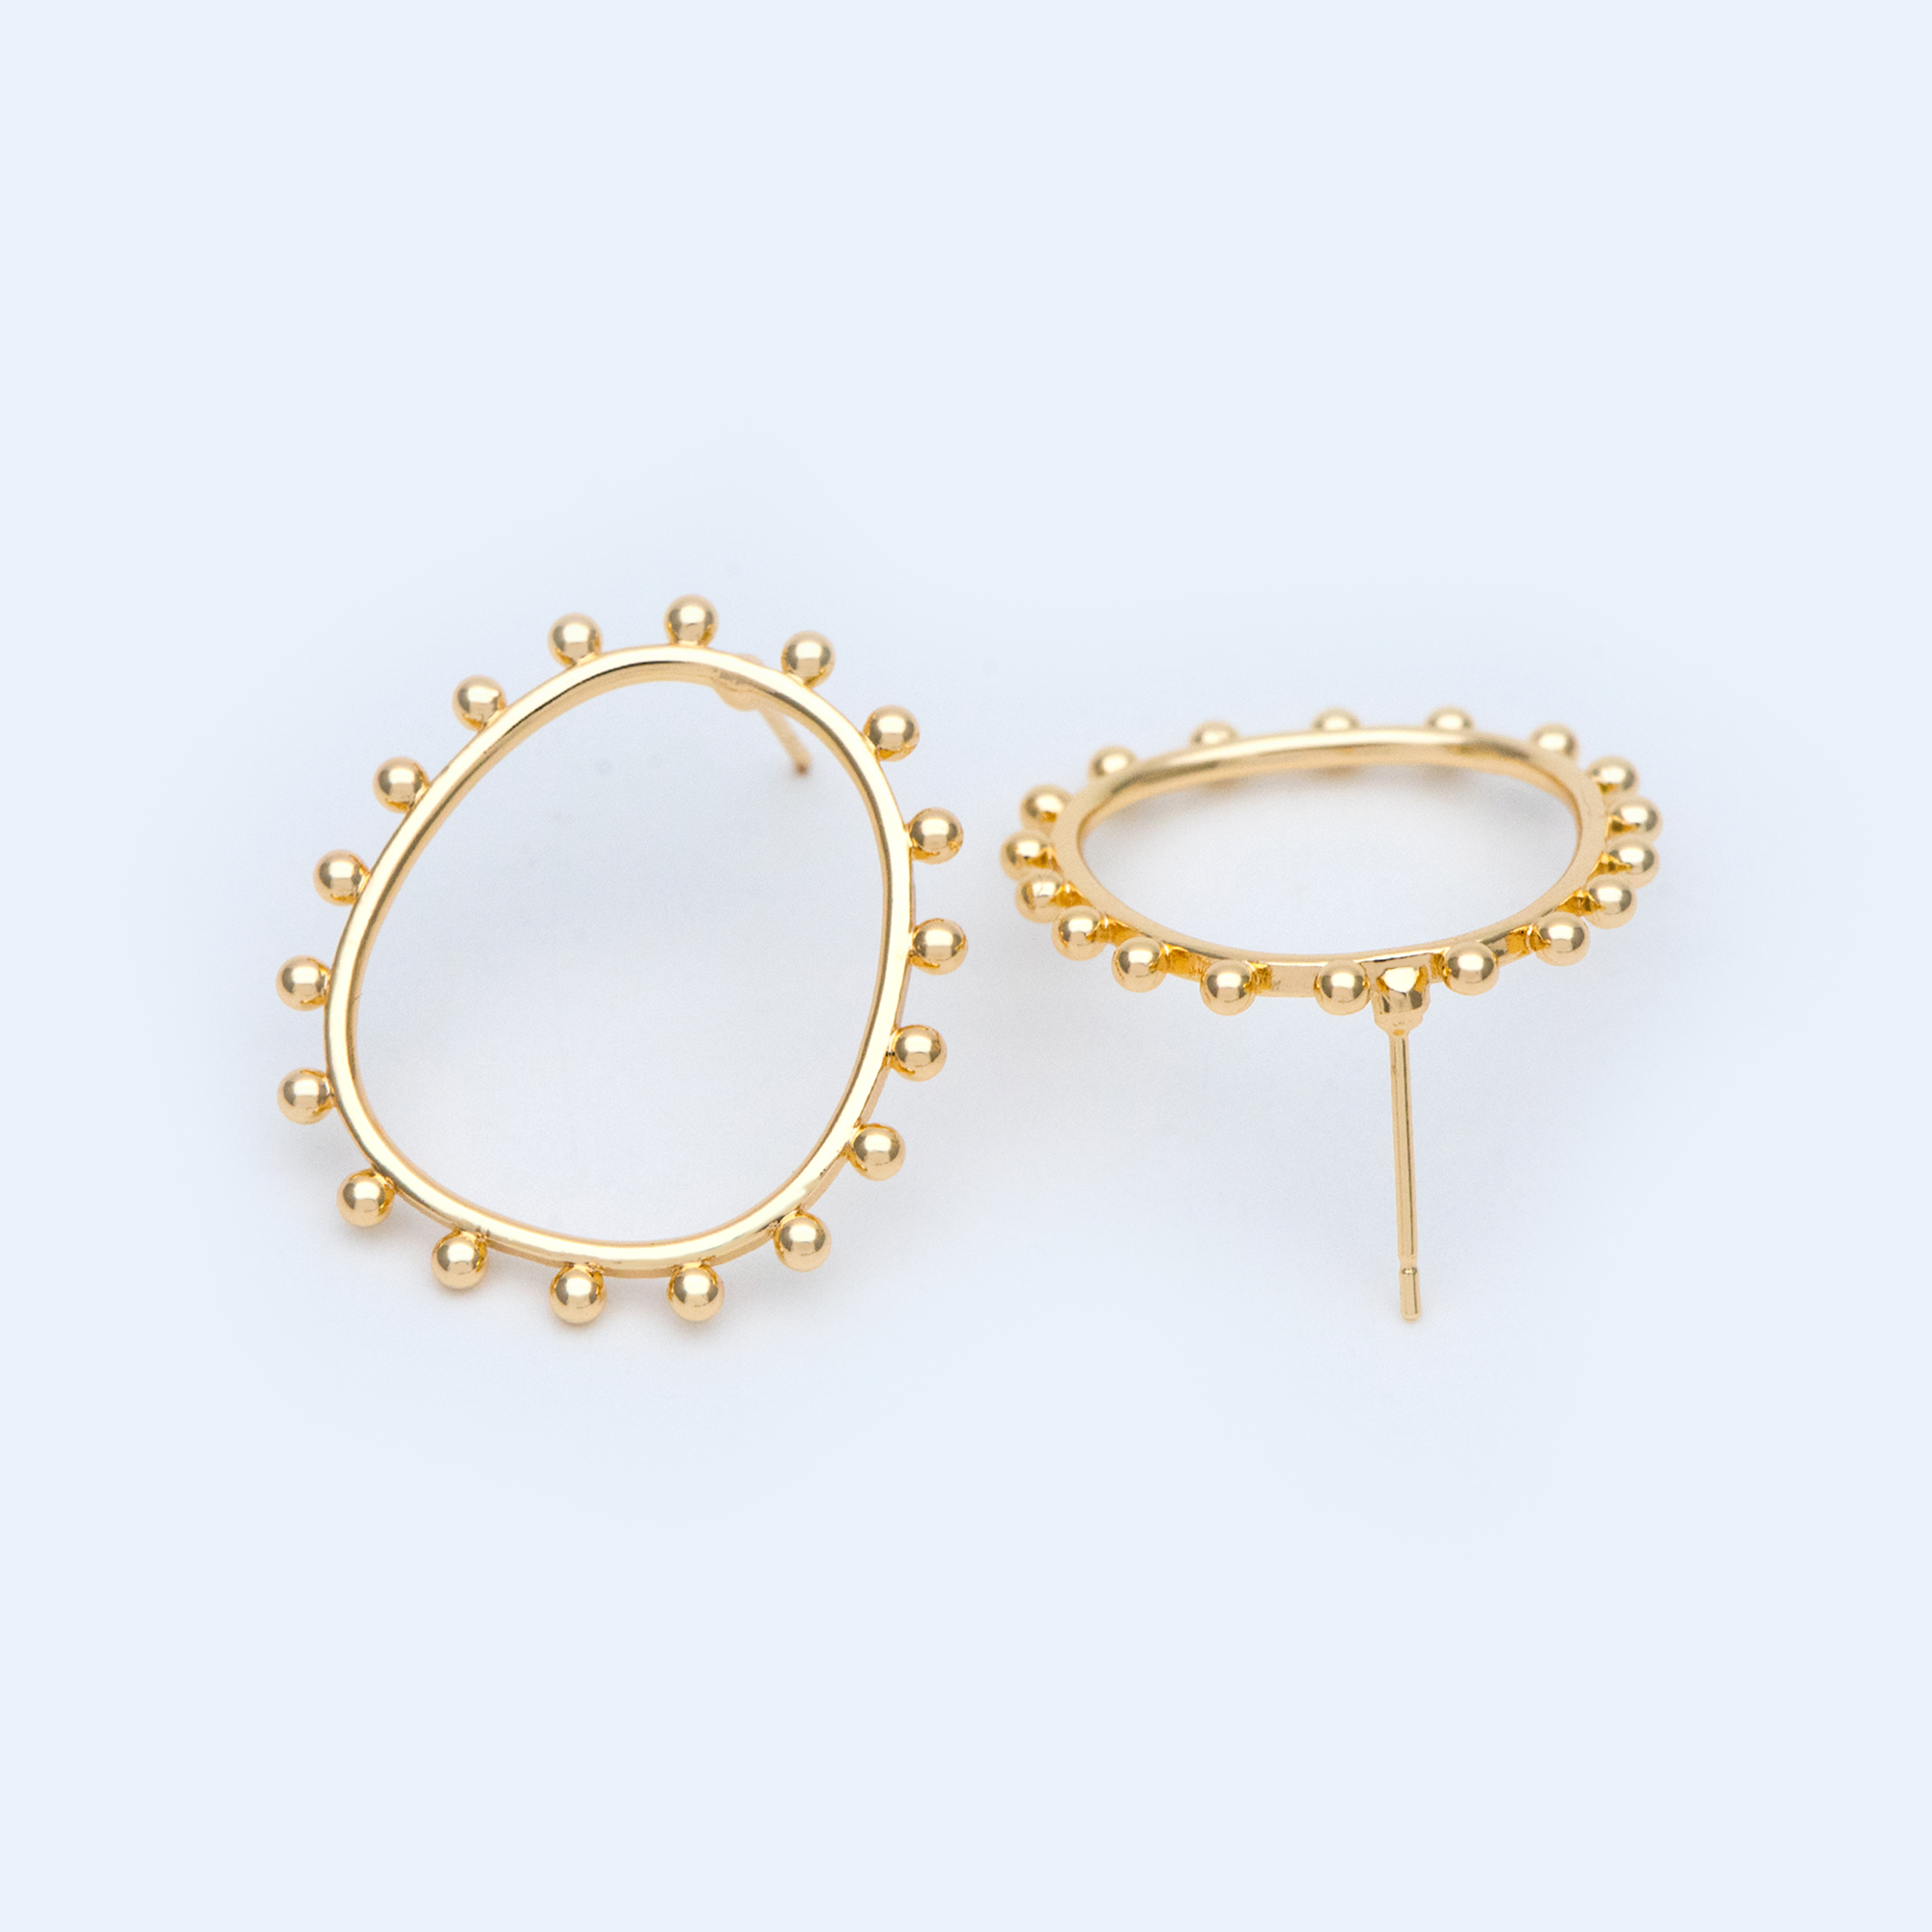 10pcs Gold Oval Hoop Ear Posts 28X25mm, Oval Circle Stud Earrings (GB-1088)